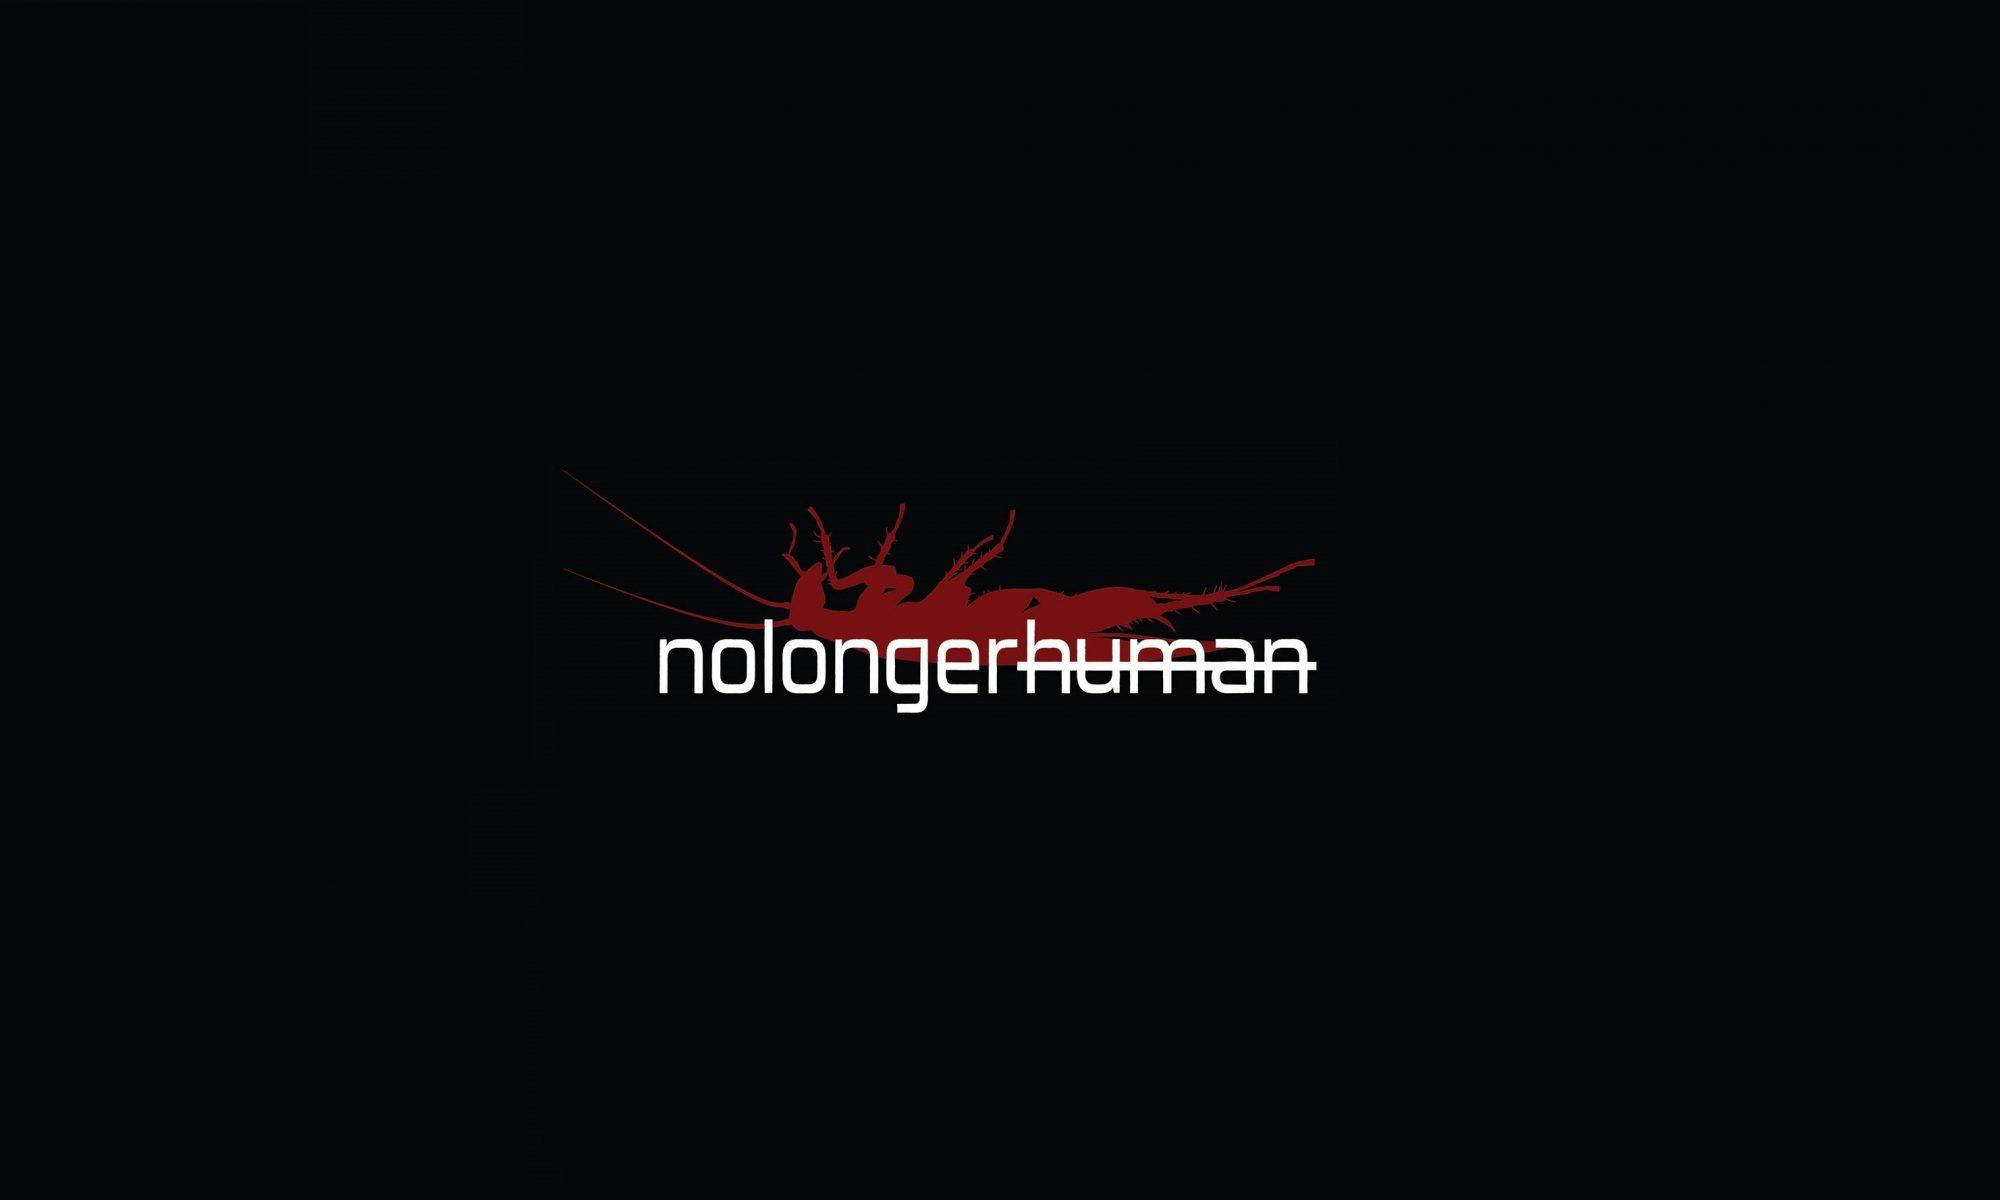 nolongerhuman